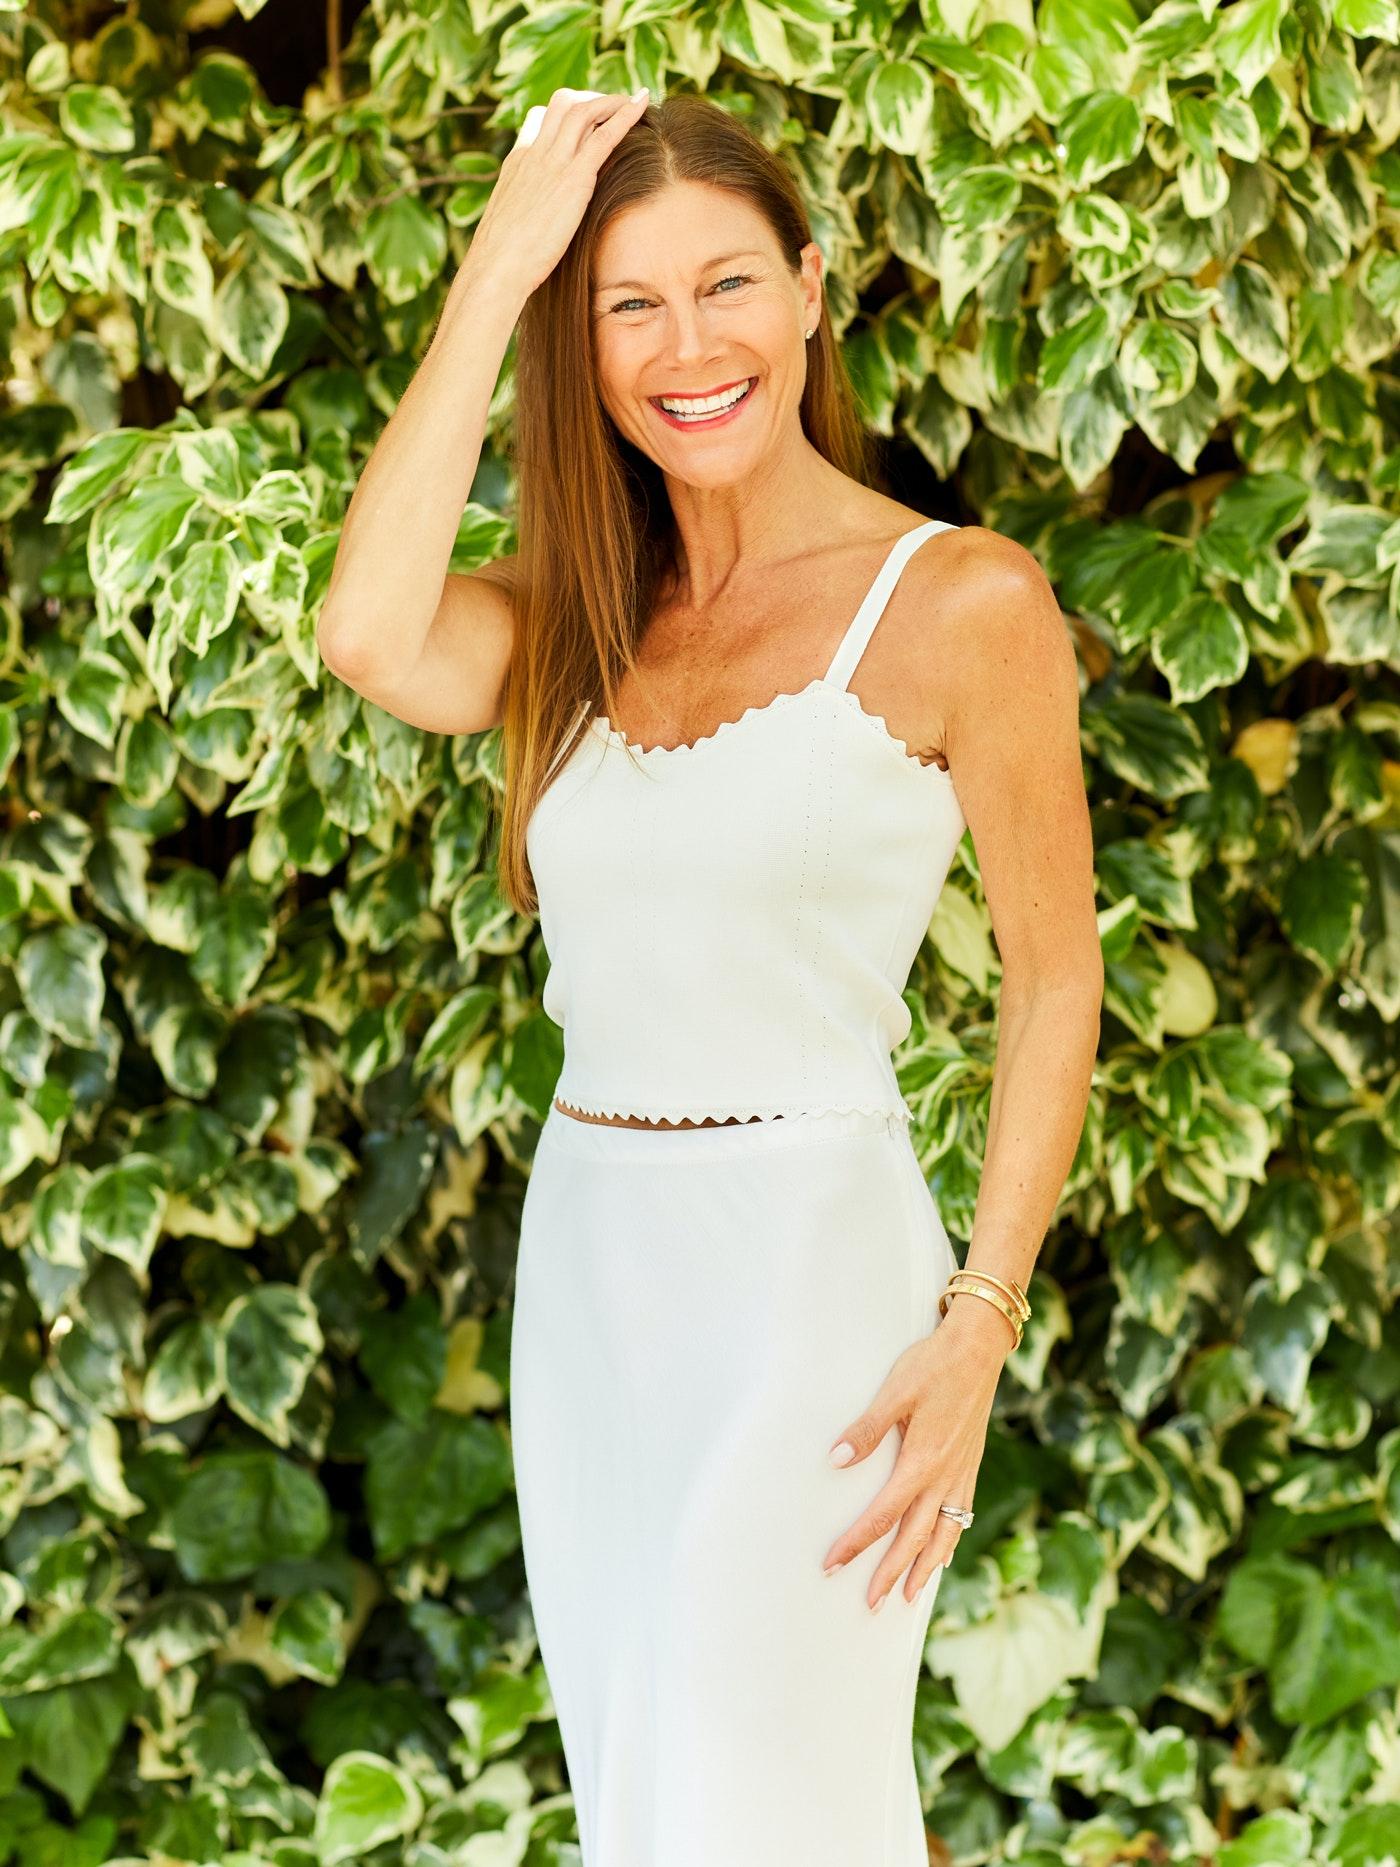 Cheryl Yannotti Foland